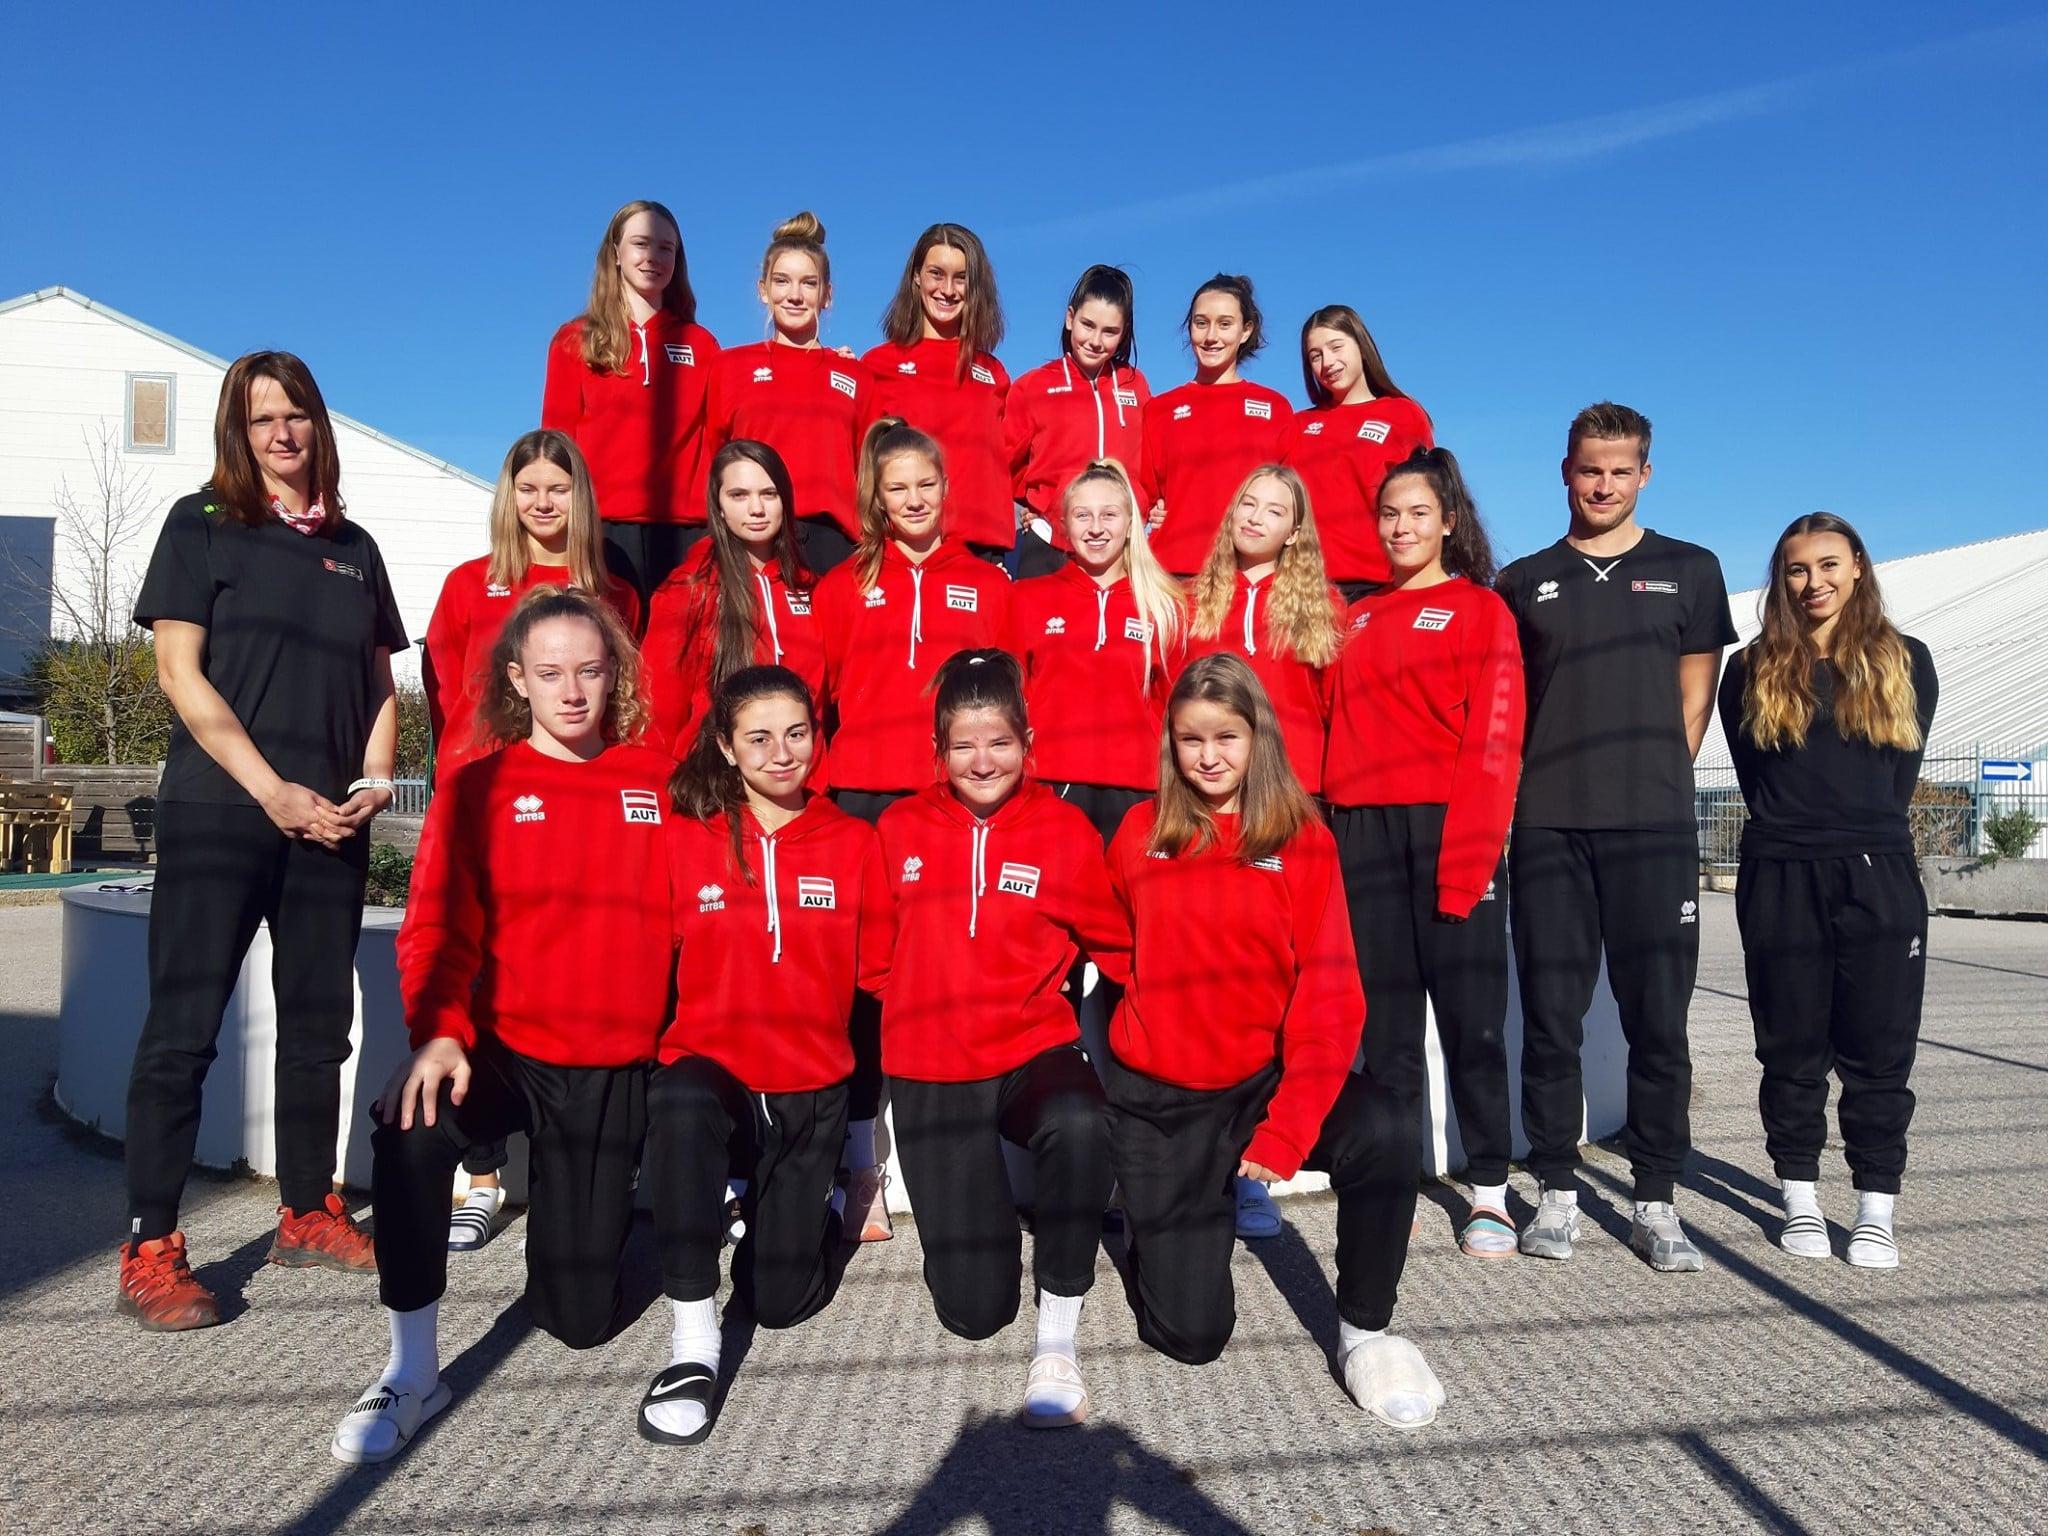 Volleyball-Jugendnationalteam-Schmiede RAZ